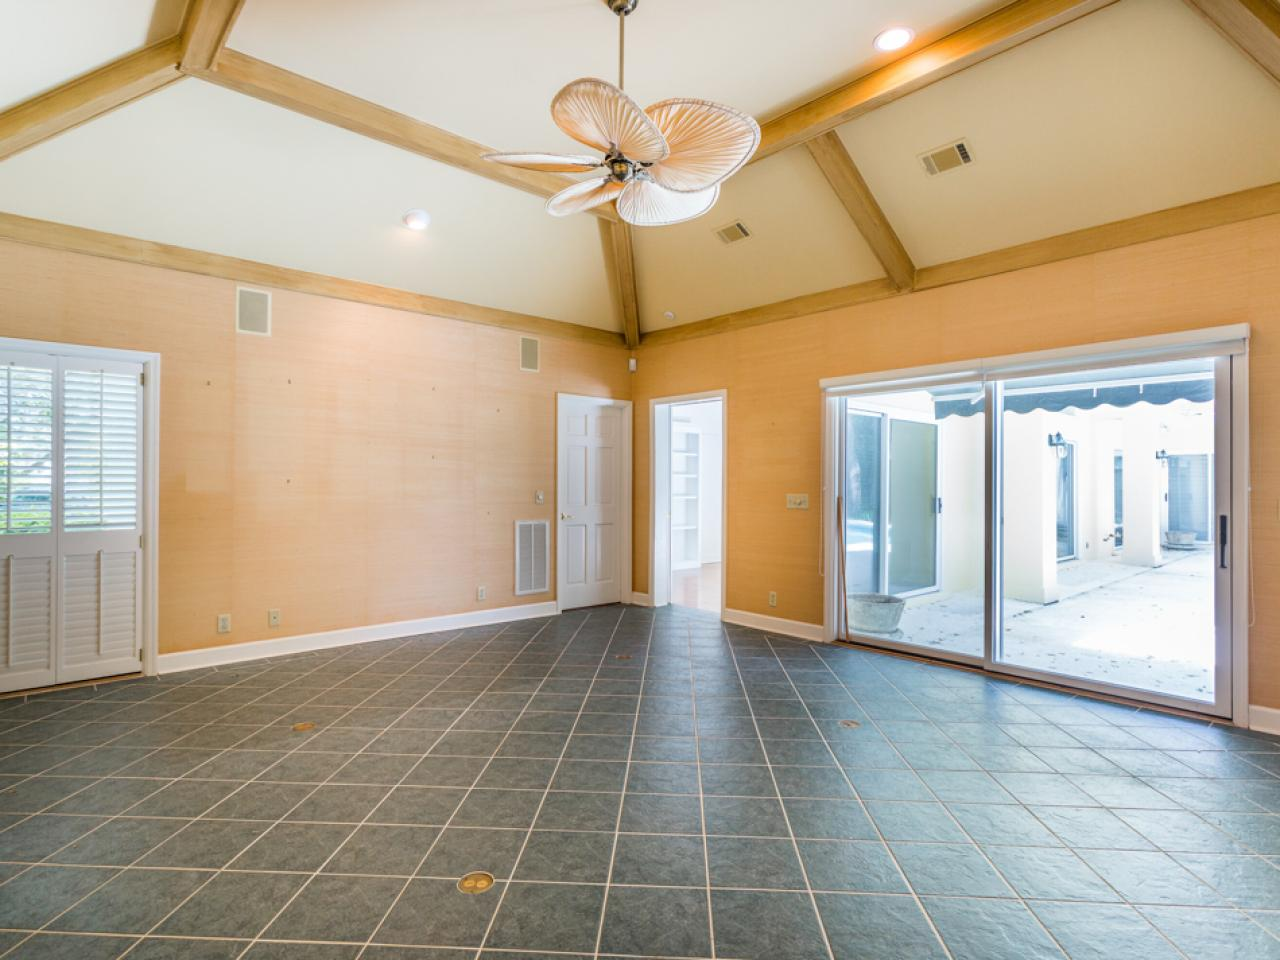 Discover The Floor Plan For Hgtv Dream Home 2017  Hgtv Dream Home 2017:  Behind The Design  Hgtv